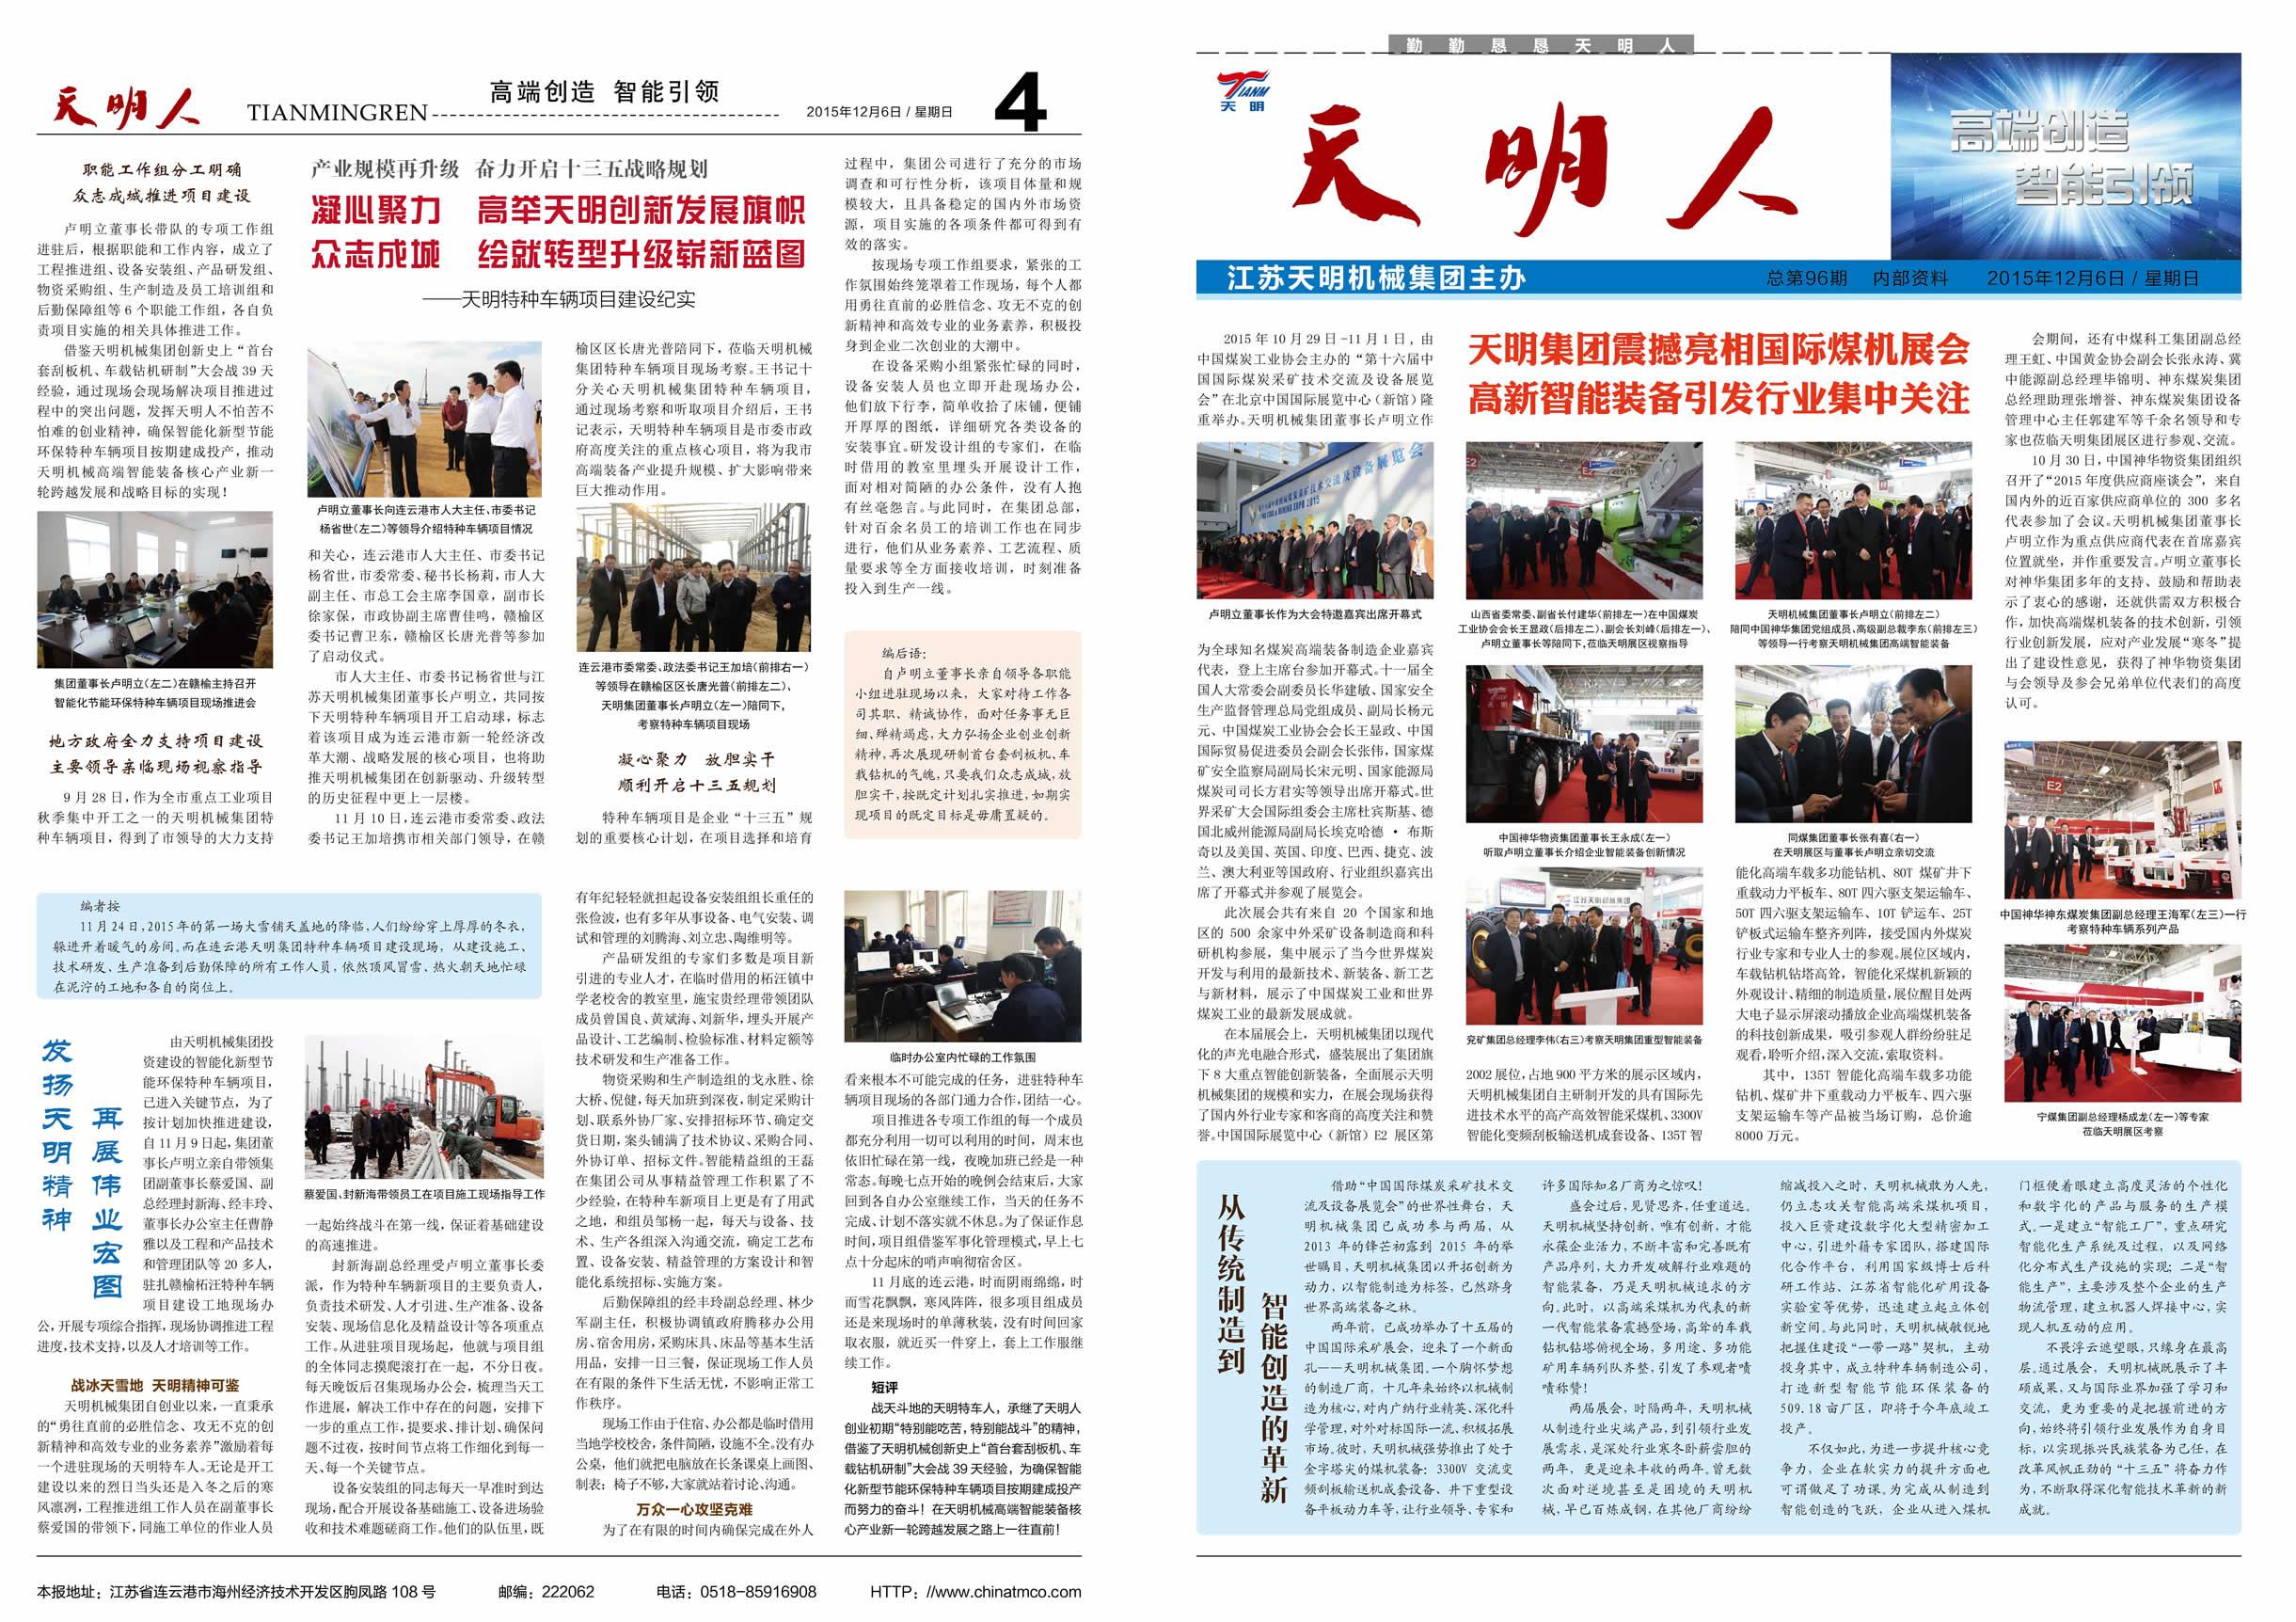 hg711皇冠国际_hg88皇冠国际平台_hg皇冠国际vip首页人2015第12期(总第96期)1、4版